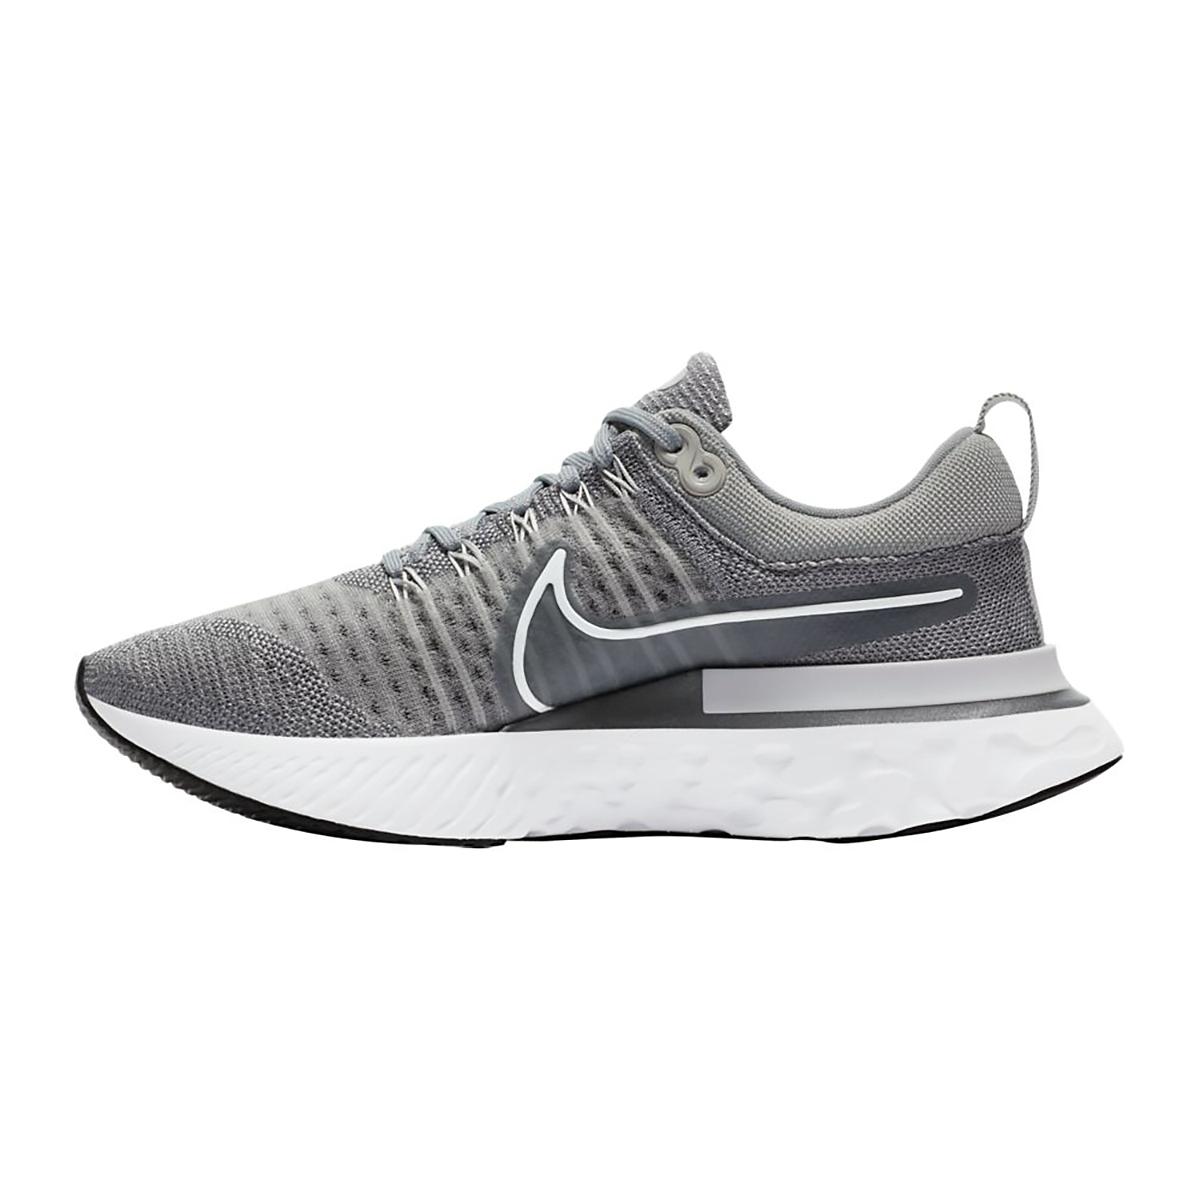 Women's Nike React Infinity Run Flyknit 2 Running Shoe - Color: Particle Grey/White/Grey Fog/Black - Size: 5 - Width: Regular, Particle Grey/White/Grey Fog/Black, large, image 2